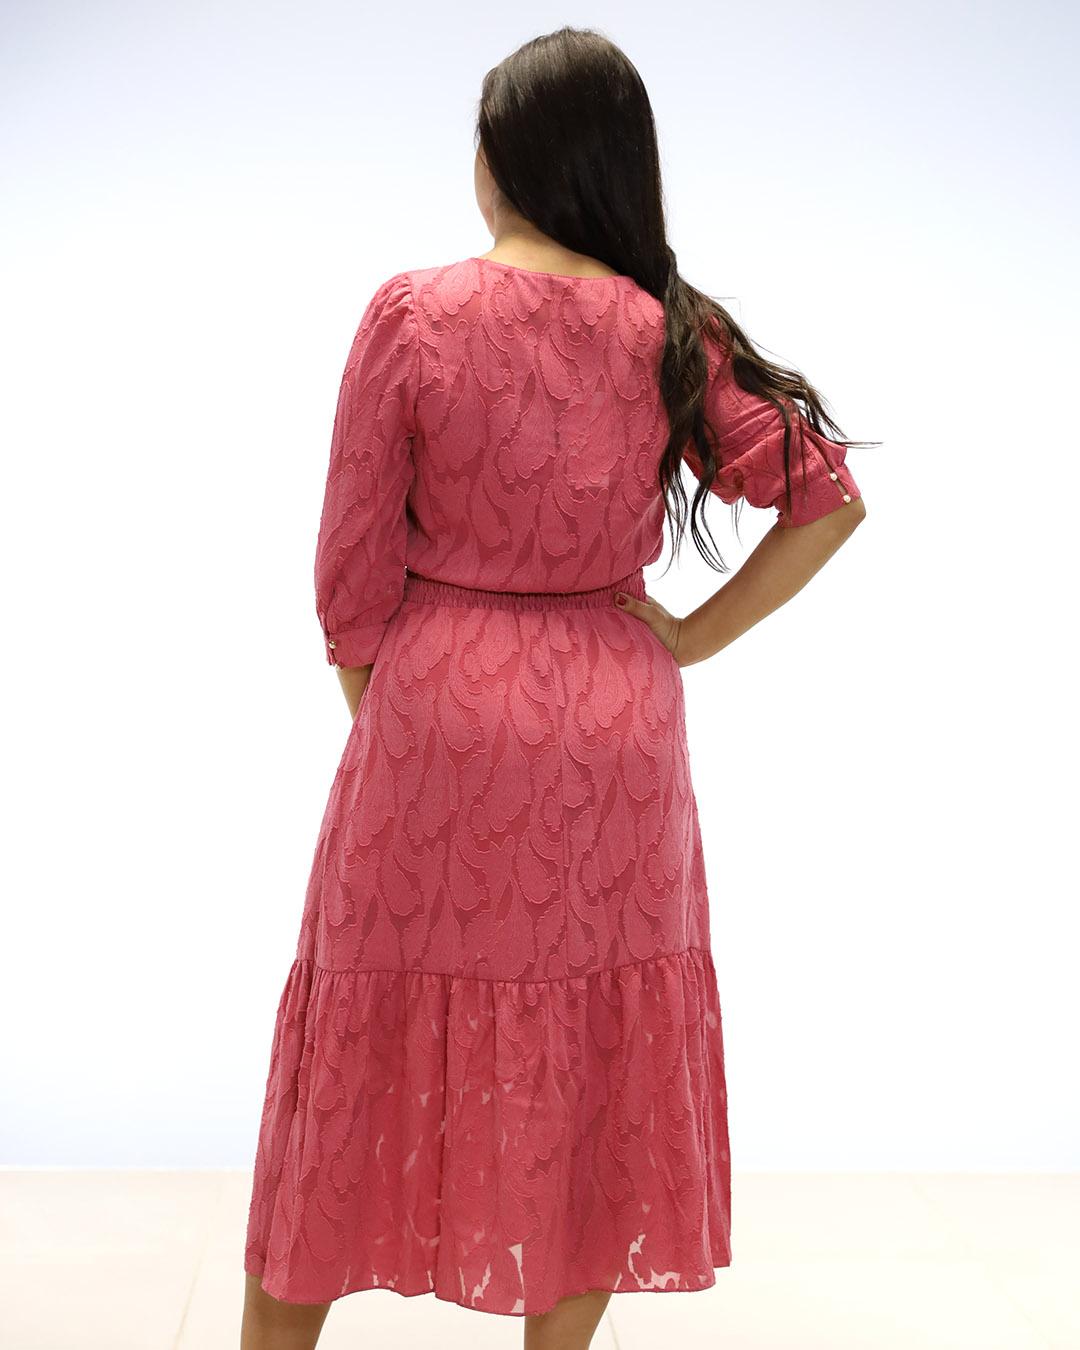 Vestido Midi Evasê Decote Transpassado Doce Flor Ariane